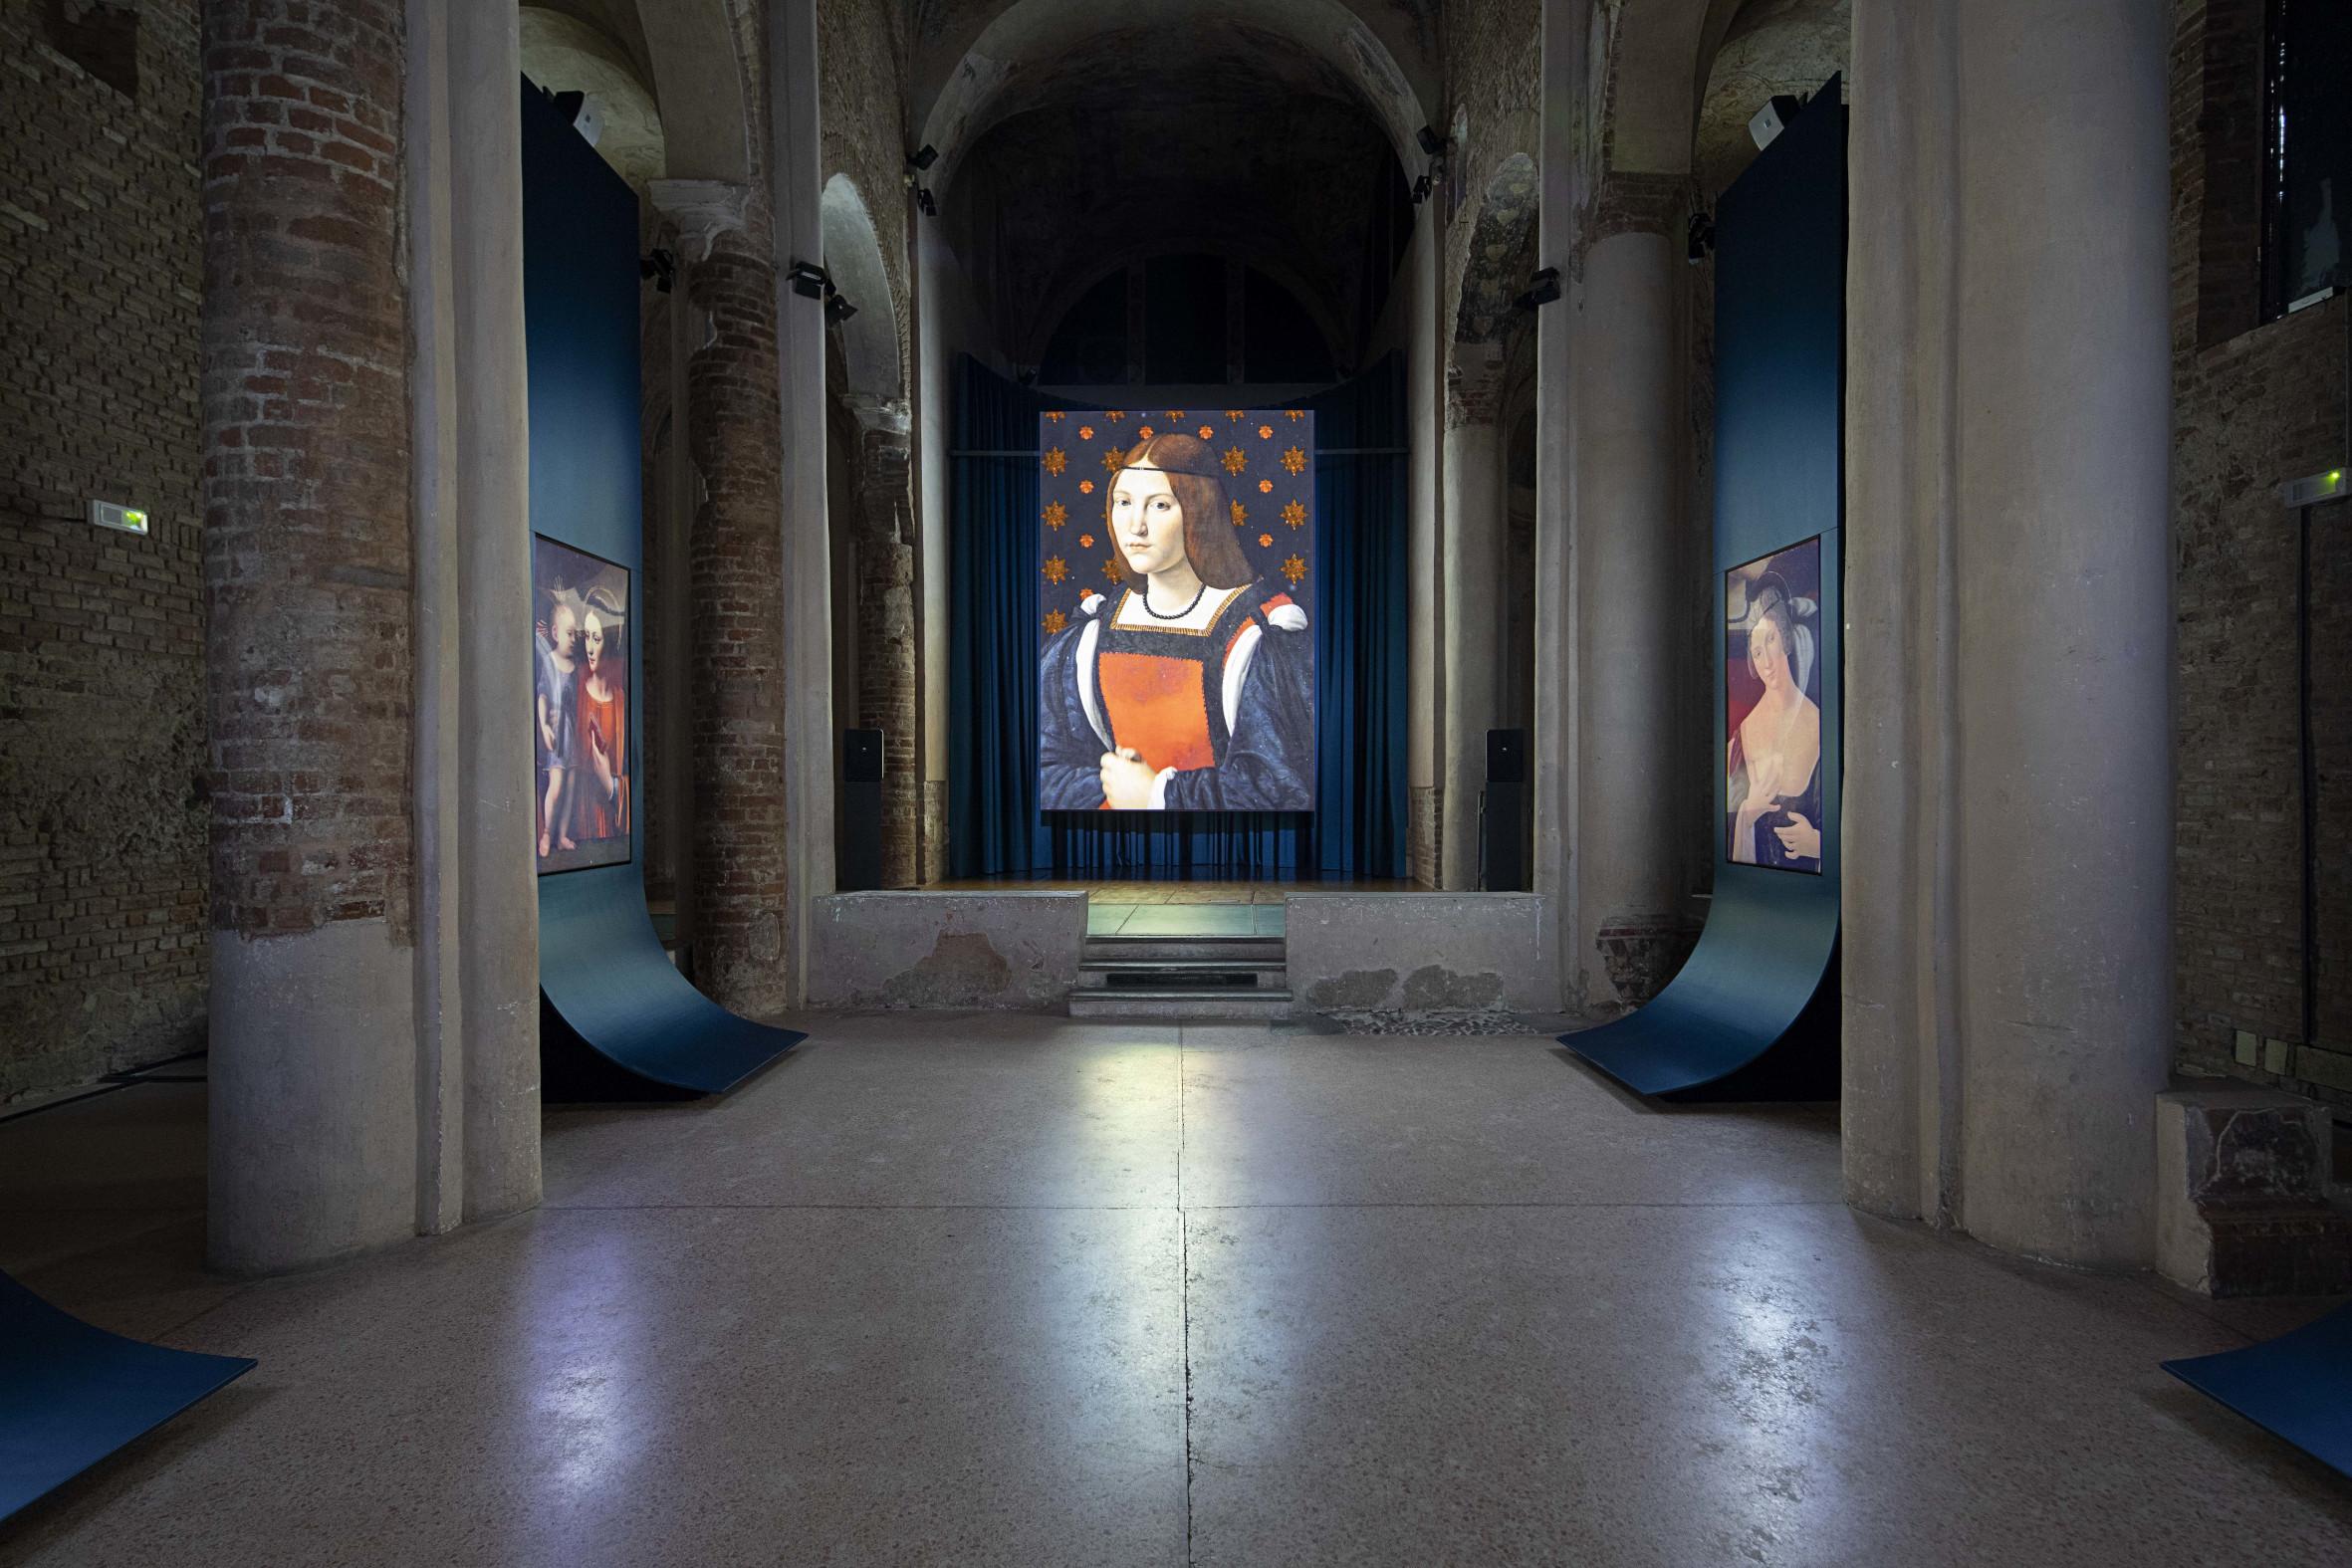 Monna Lisa Who-Karmachina-Chiesa di Santa Maria Gualtieri-Pavia